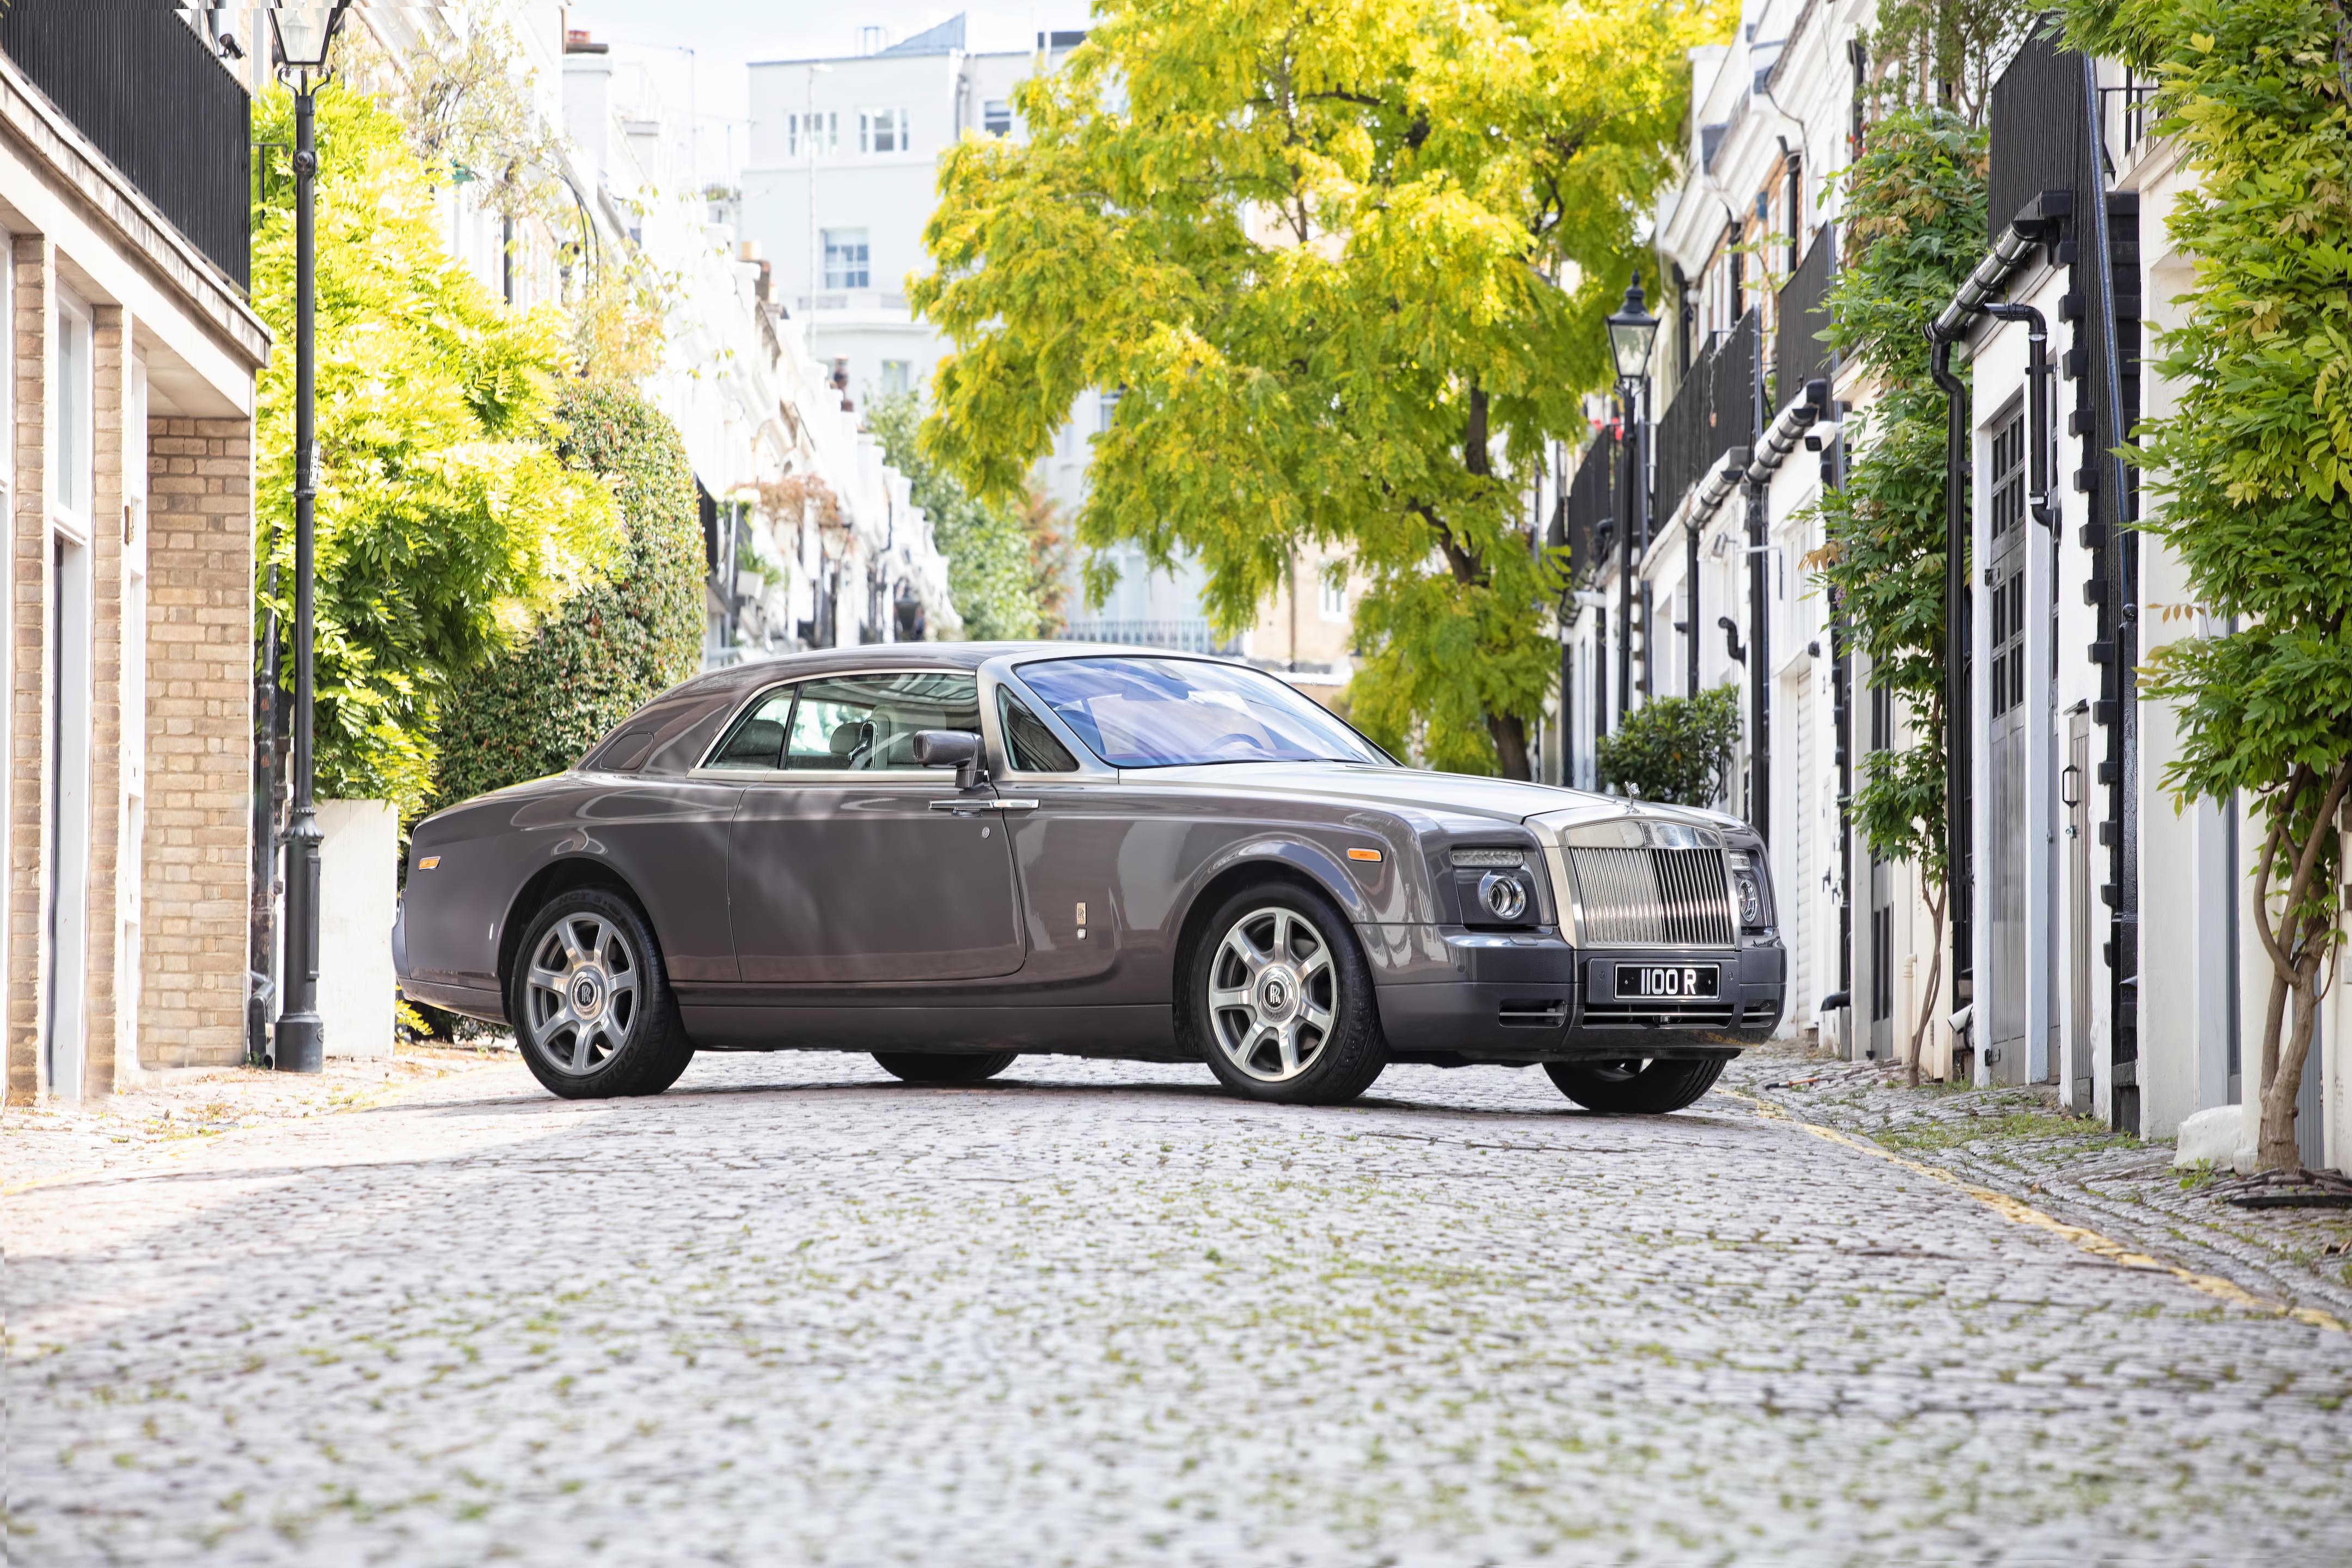 2010 Rolls-Royce Phantom Coupé  Chassis no. SCA3C68059UX29149